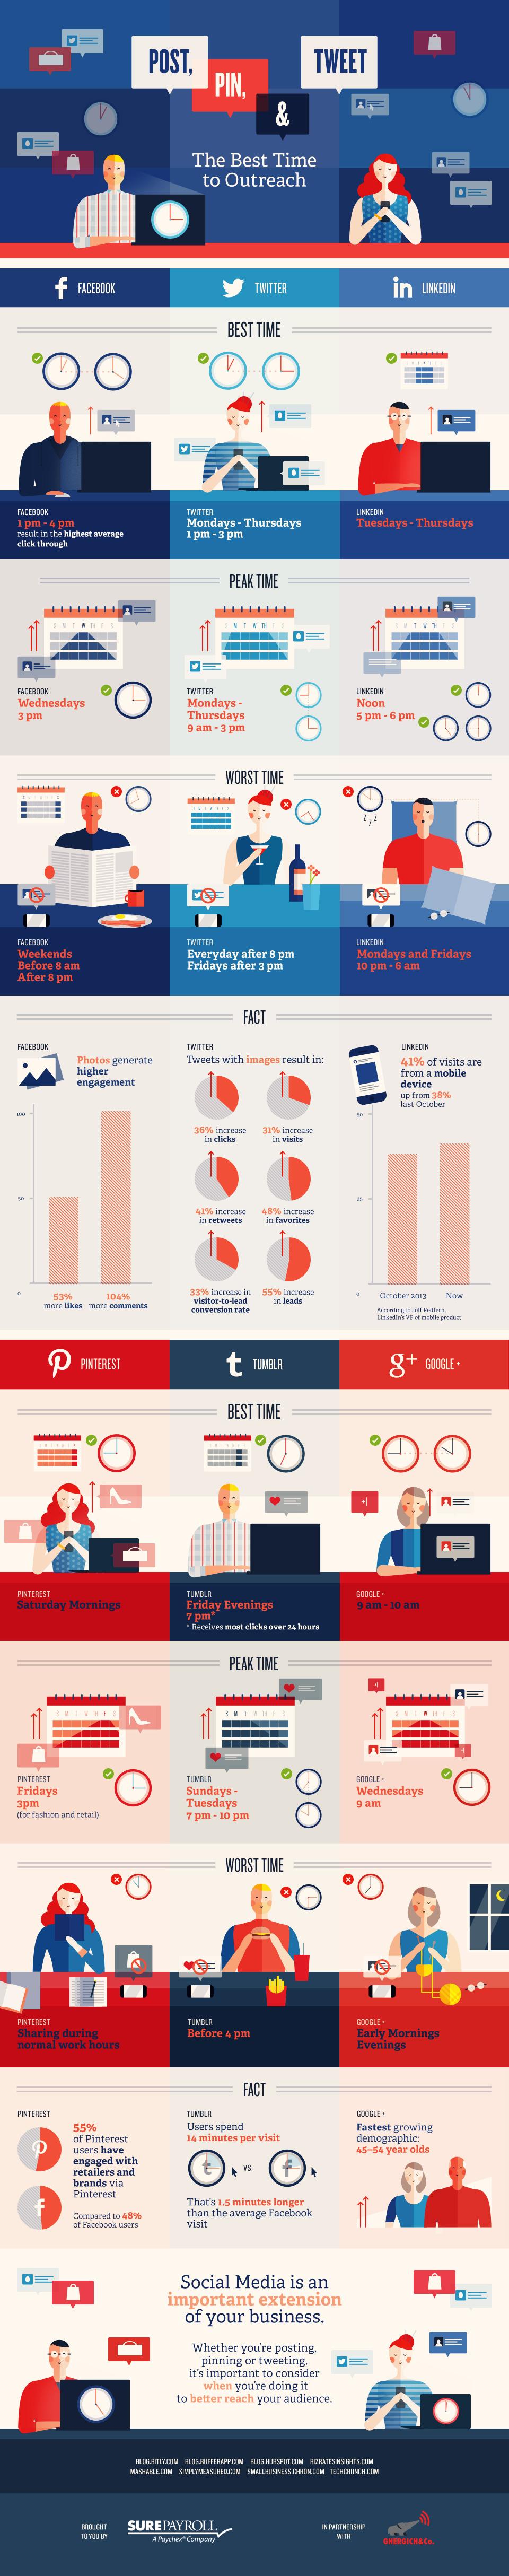 Infografia-Mejores-Horas-Publicar-Redes-Sociales-Facebook-Twitter-Linkedin-Pinterest-Tumblr-PB